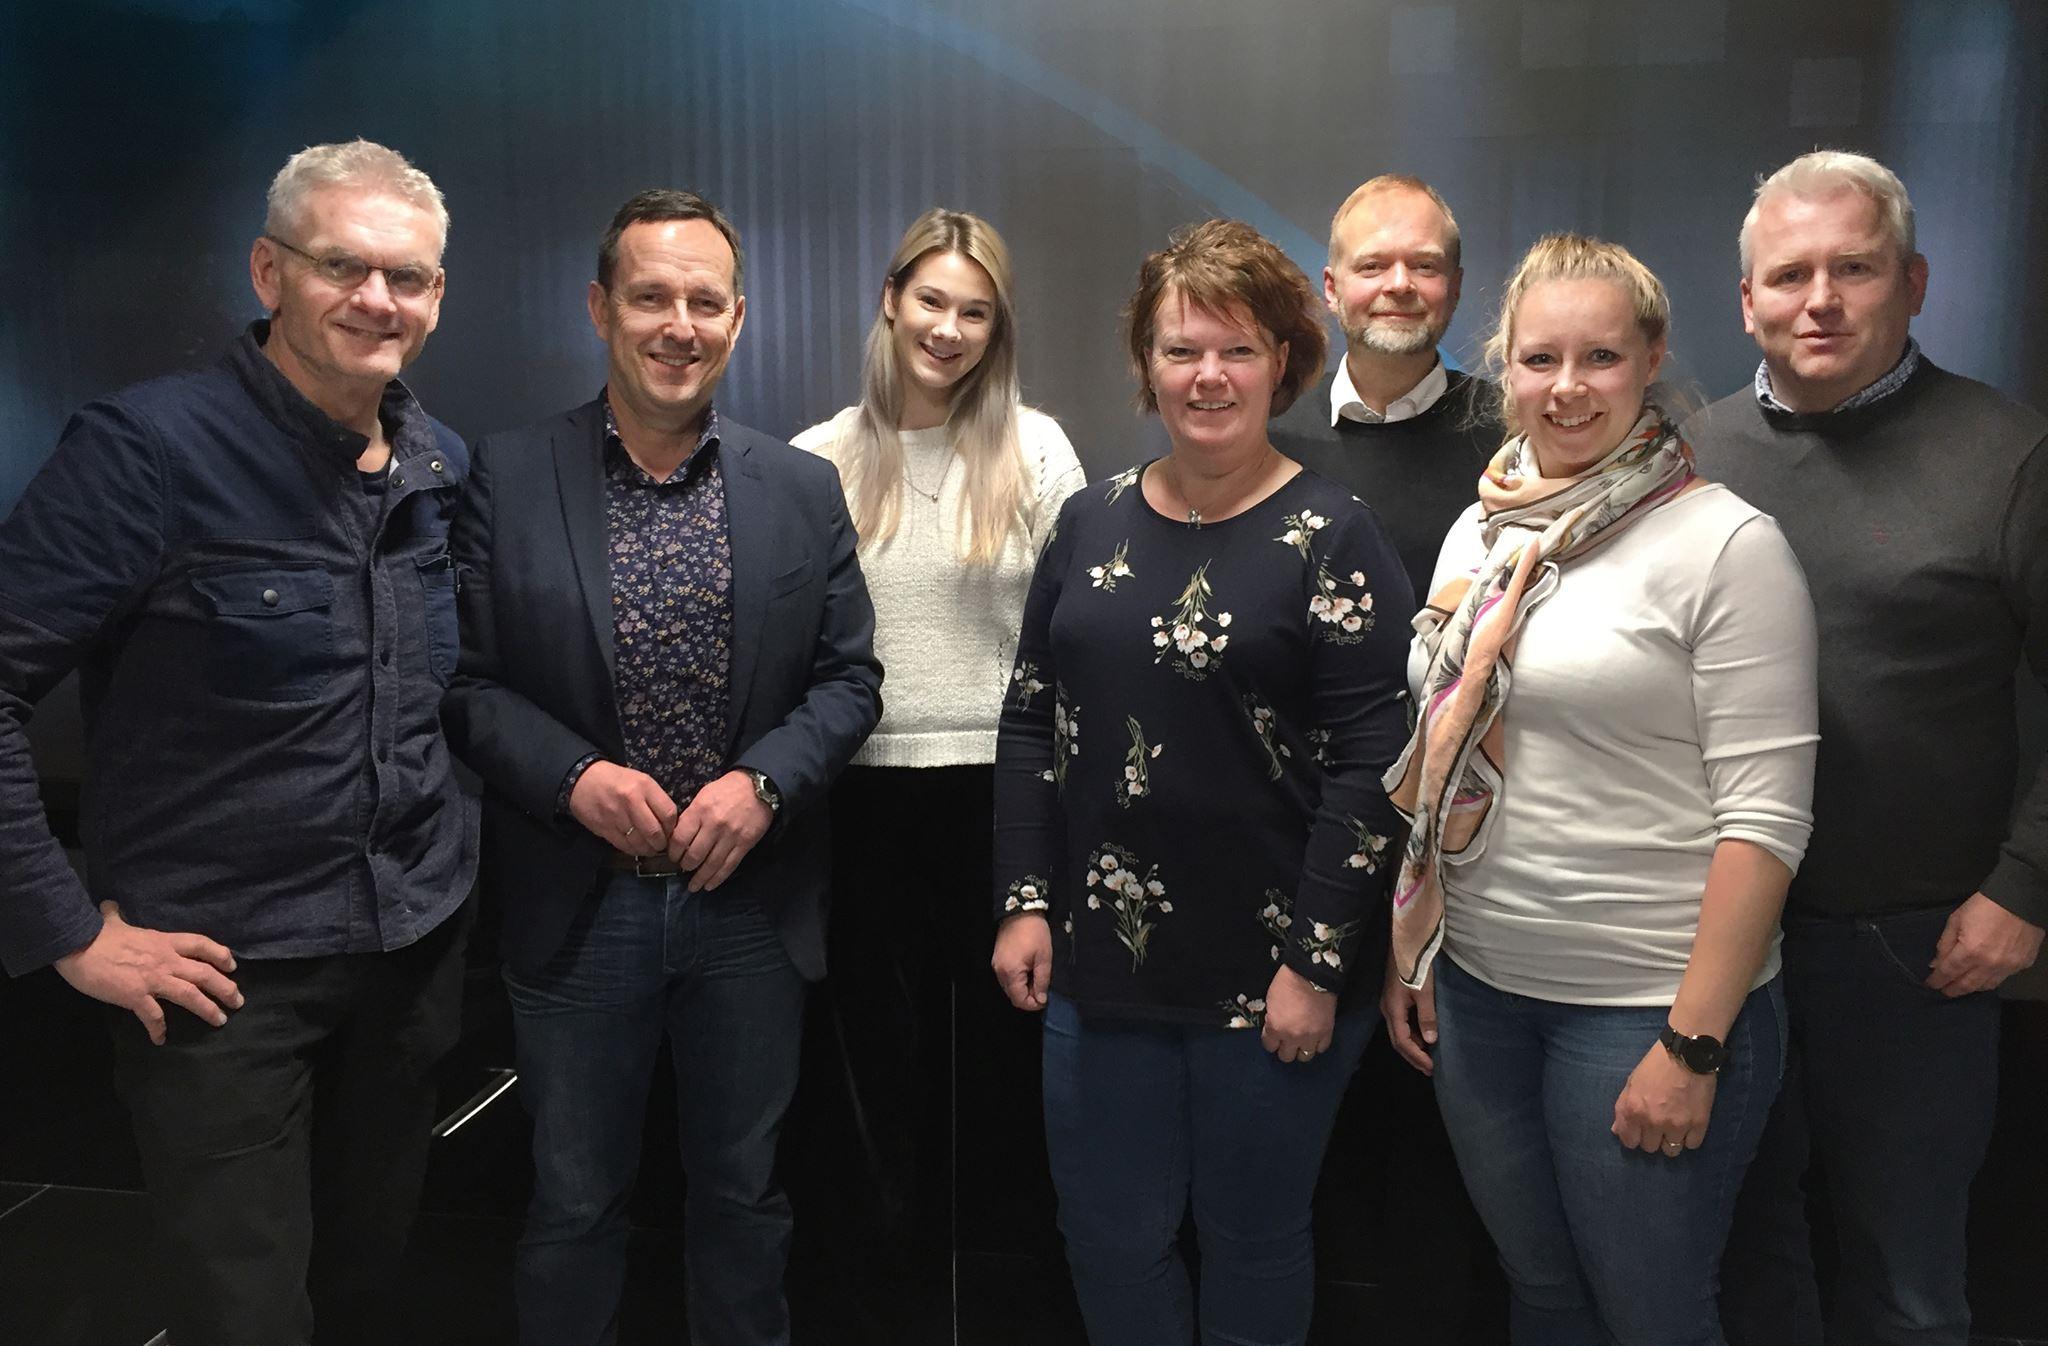 Styret i Norske Sportsjournalisters Forbund for 2018/2019.